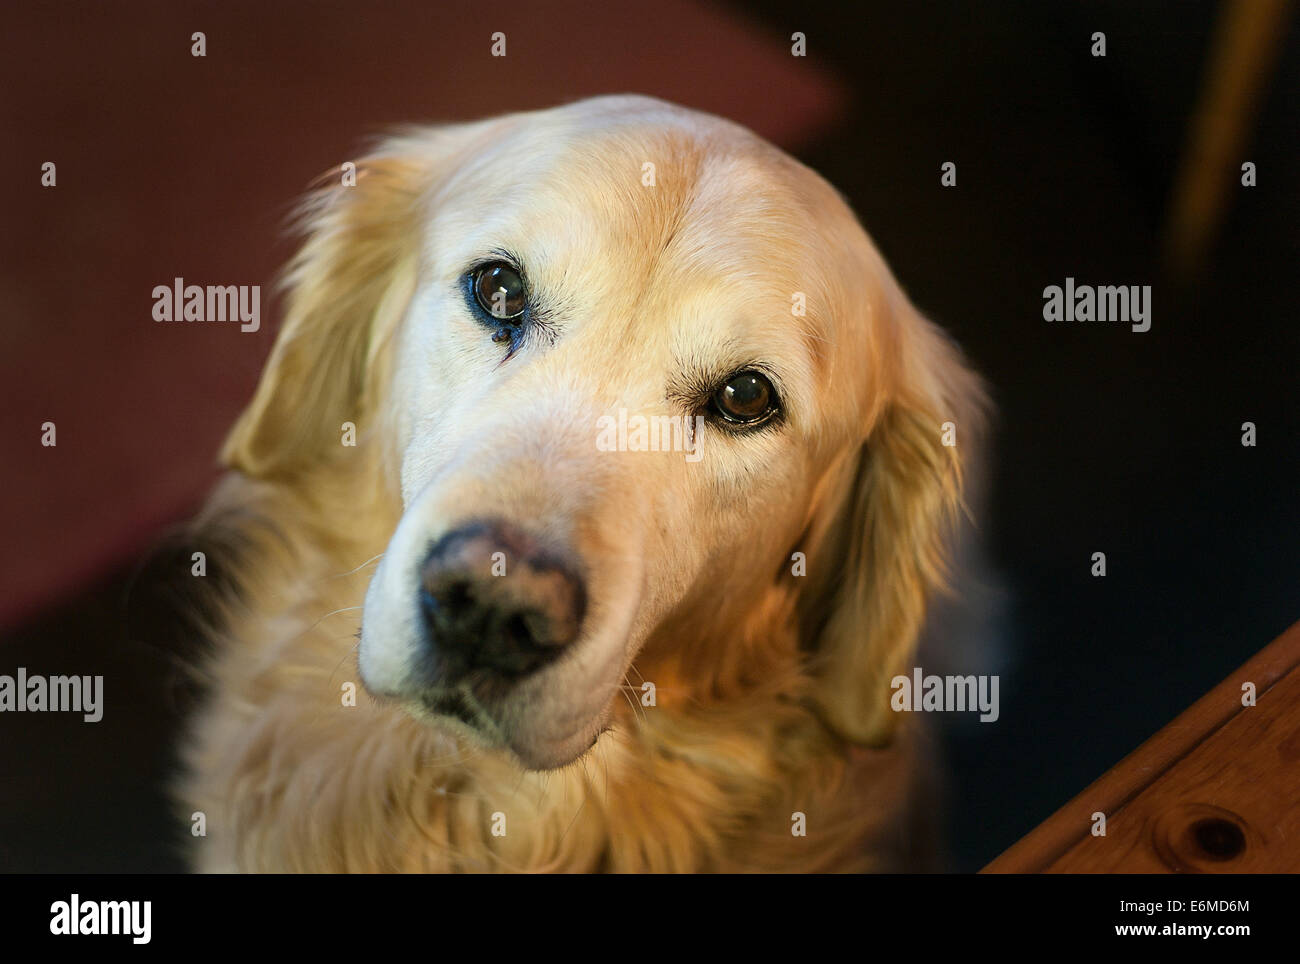 Golden retriever dog in attentive mood - Stock Image